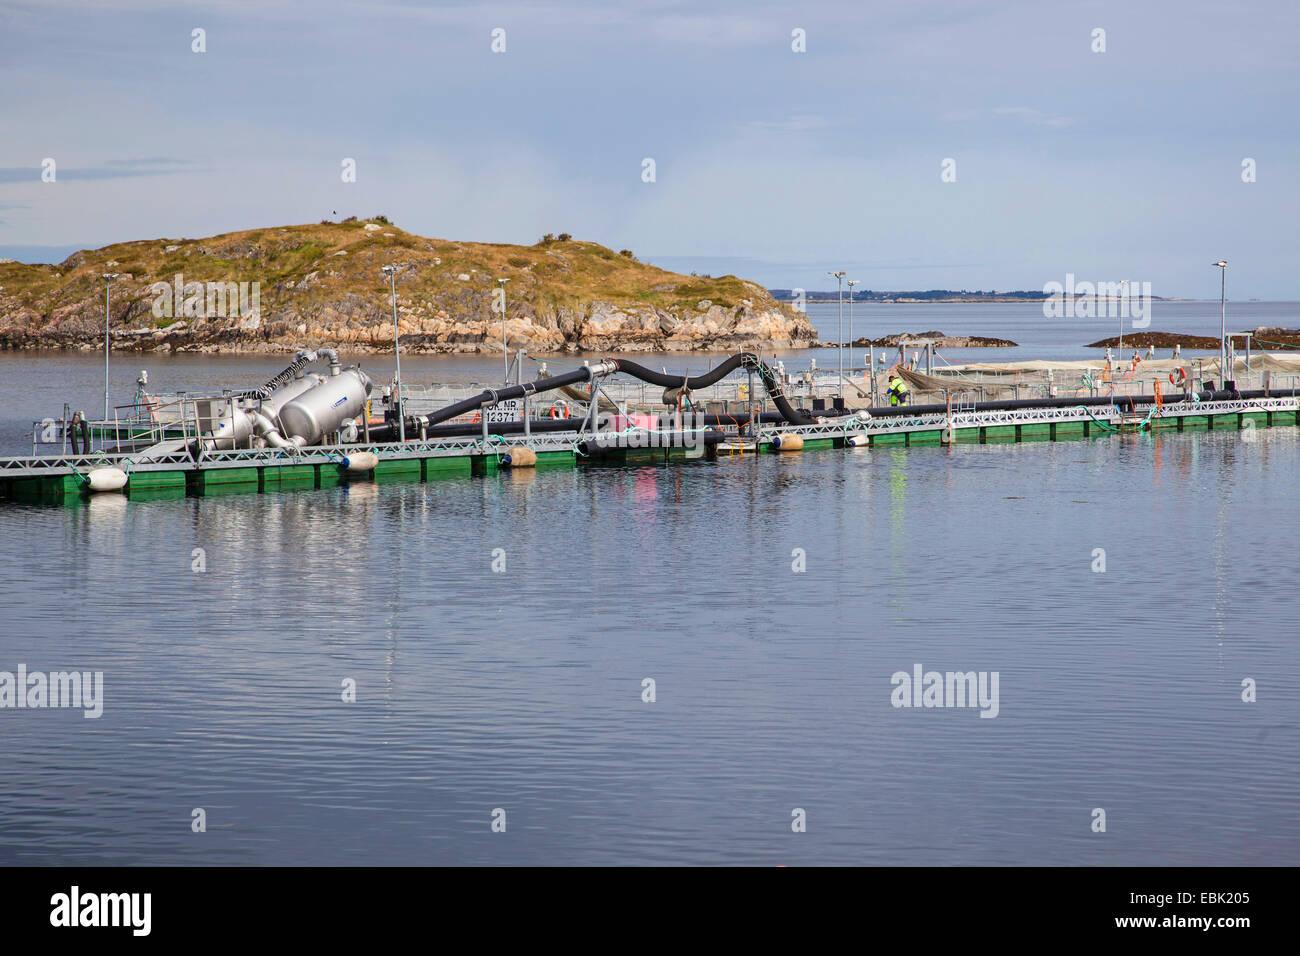 Atlantic salmon, ouananiche, lake Atlantic salmon, landlocked salmon, Sebago salmon (Salmo salar), salmonid farm, - Stock Image